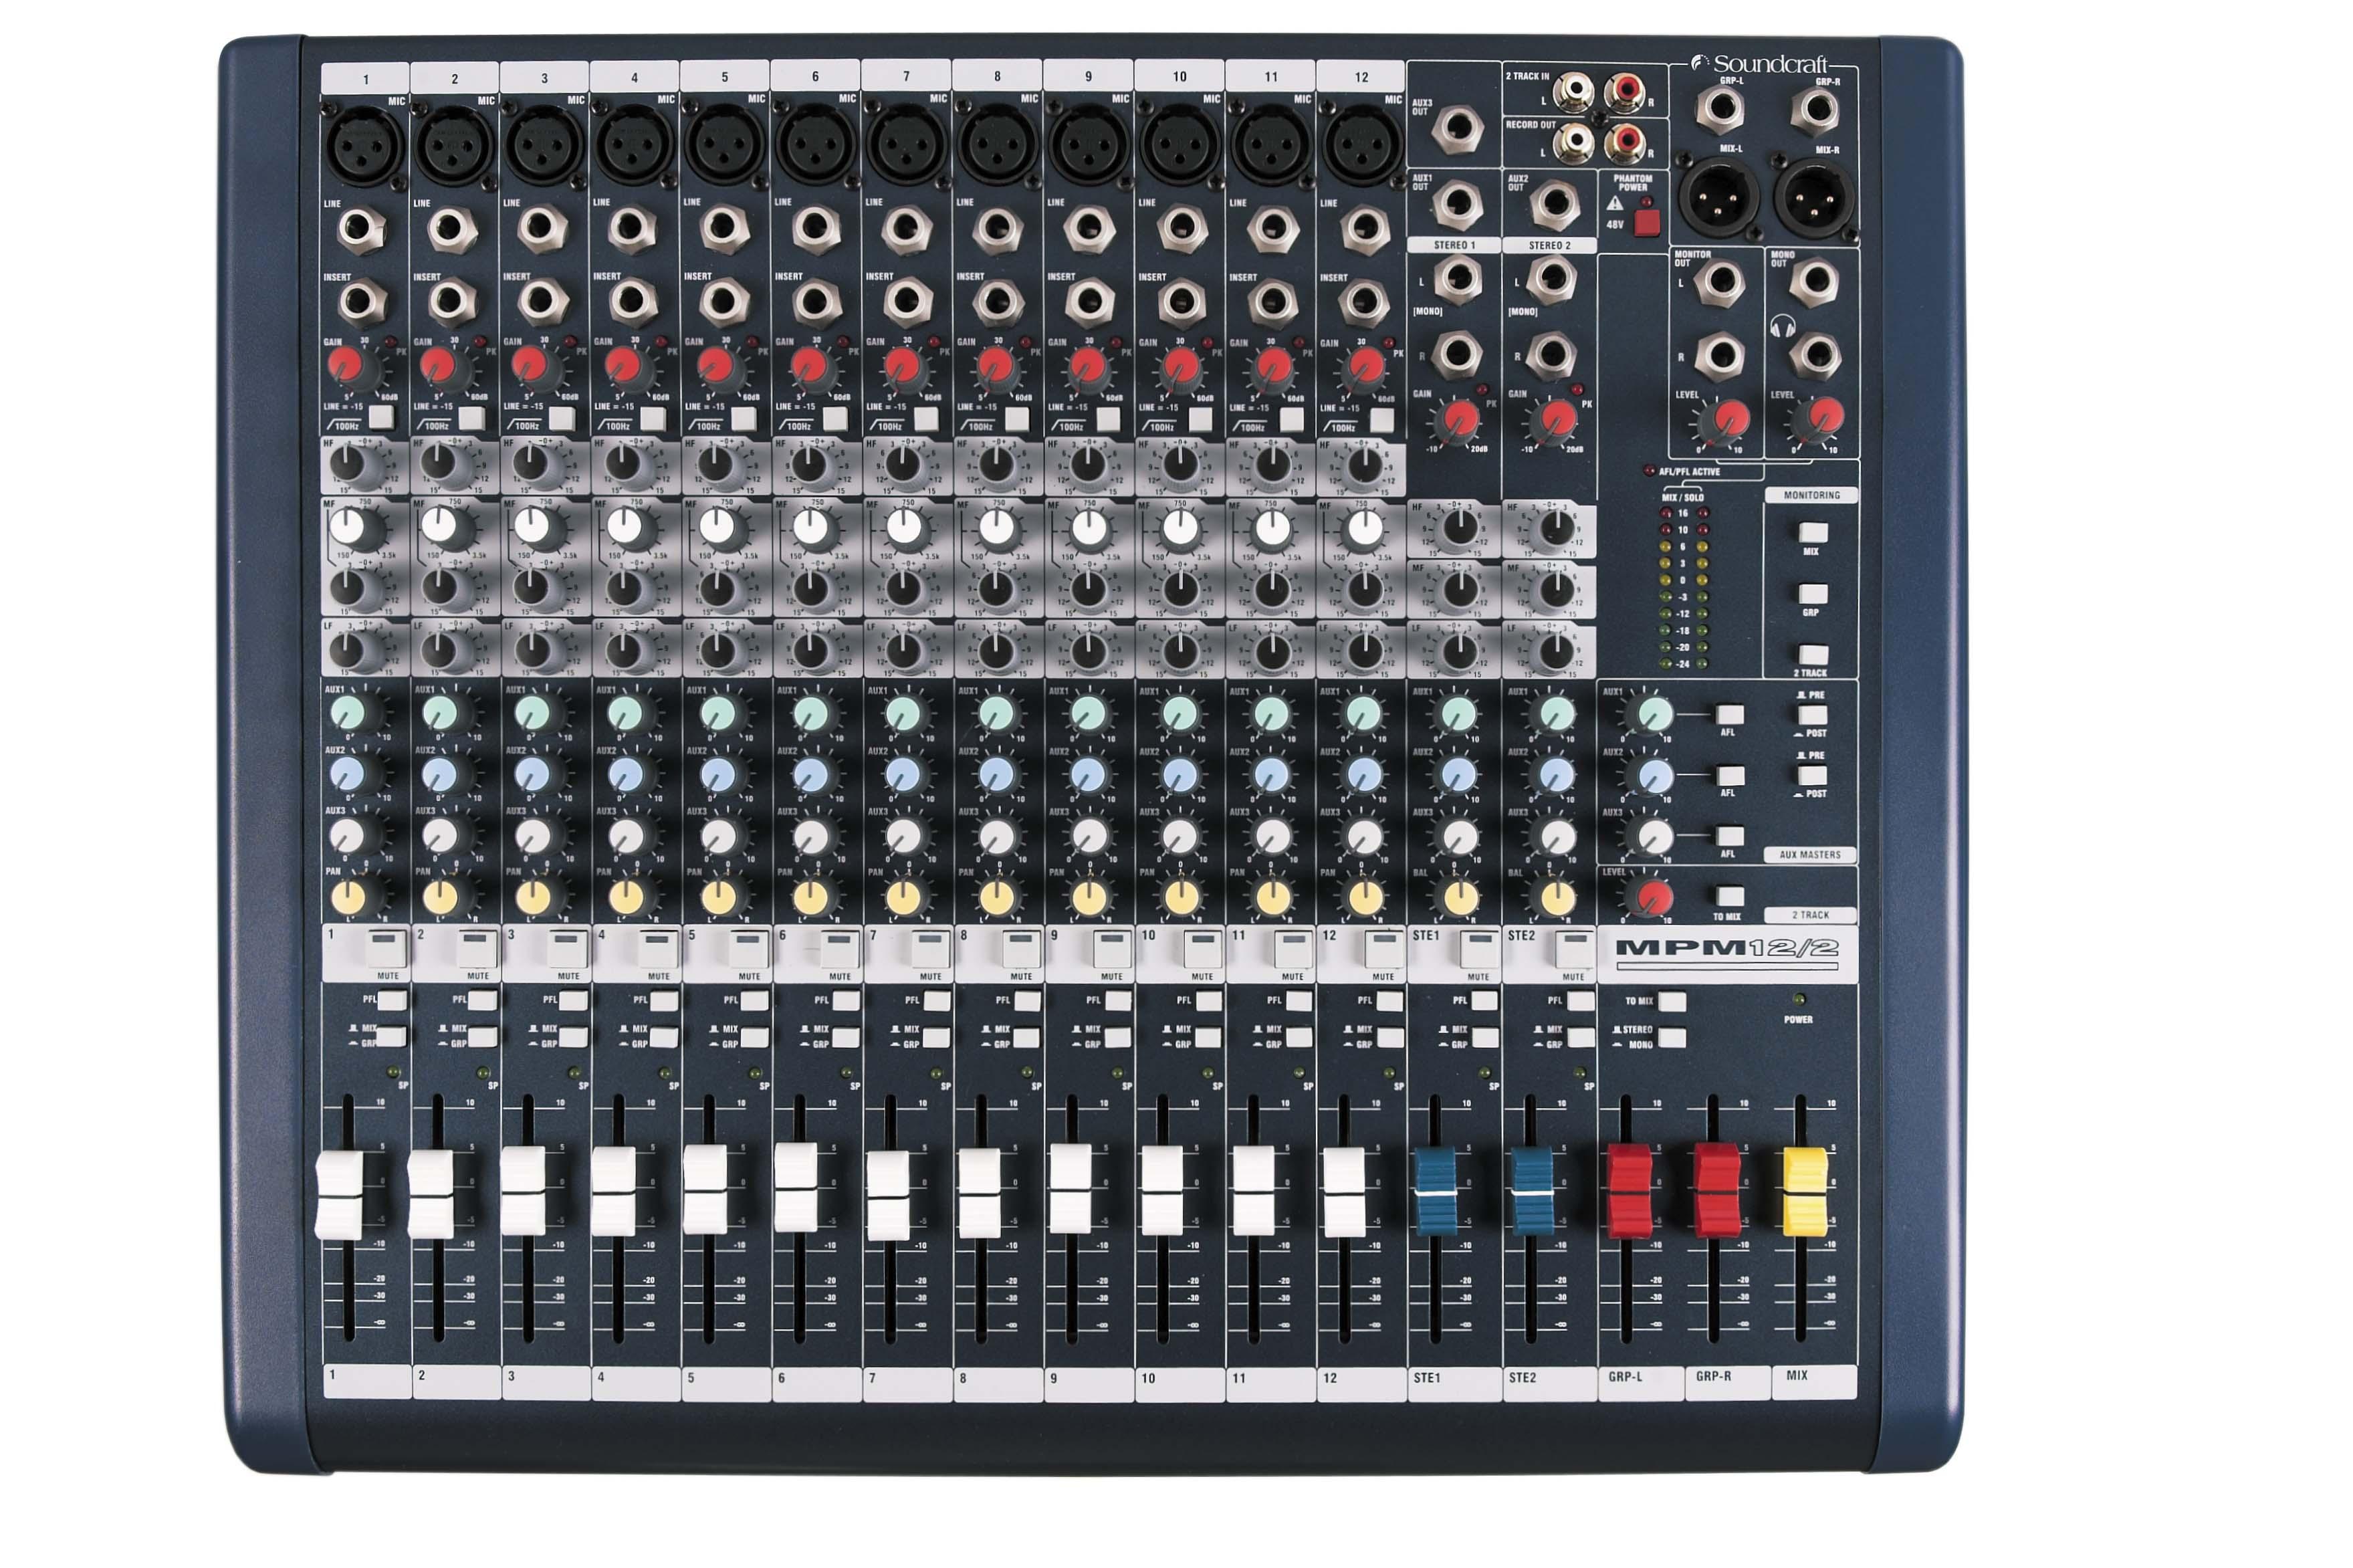 MPM | Soundcraft - Professional Audio Mixers